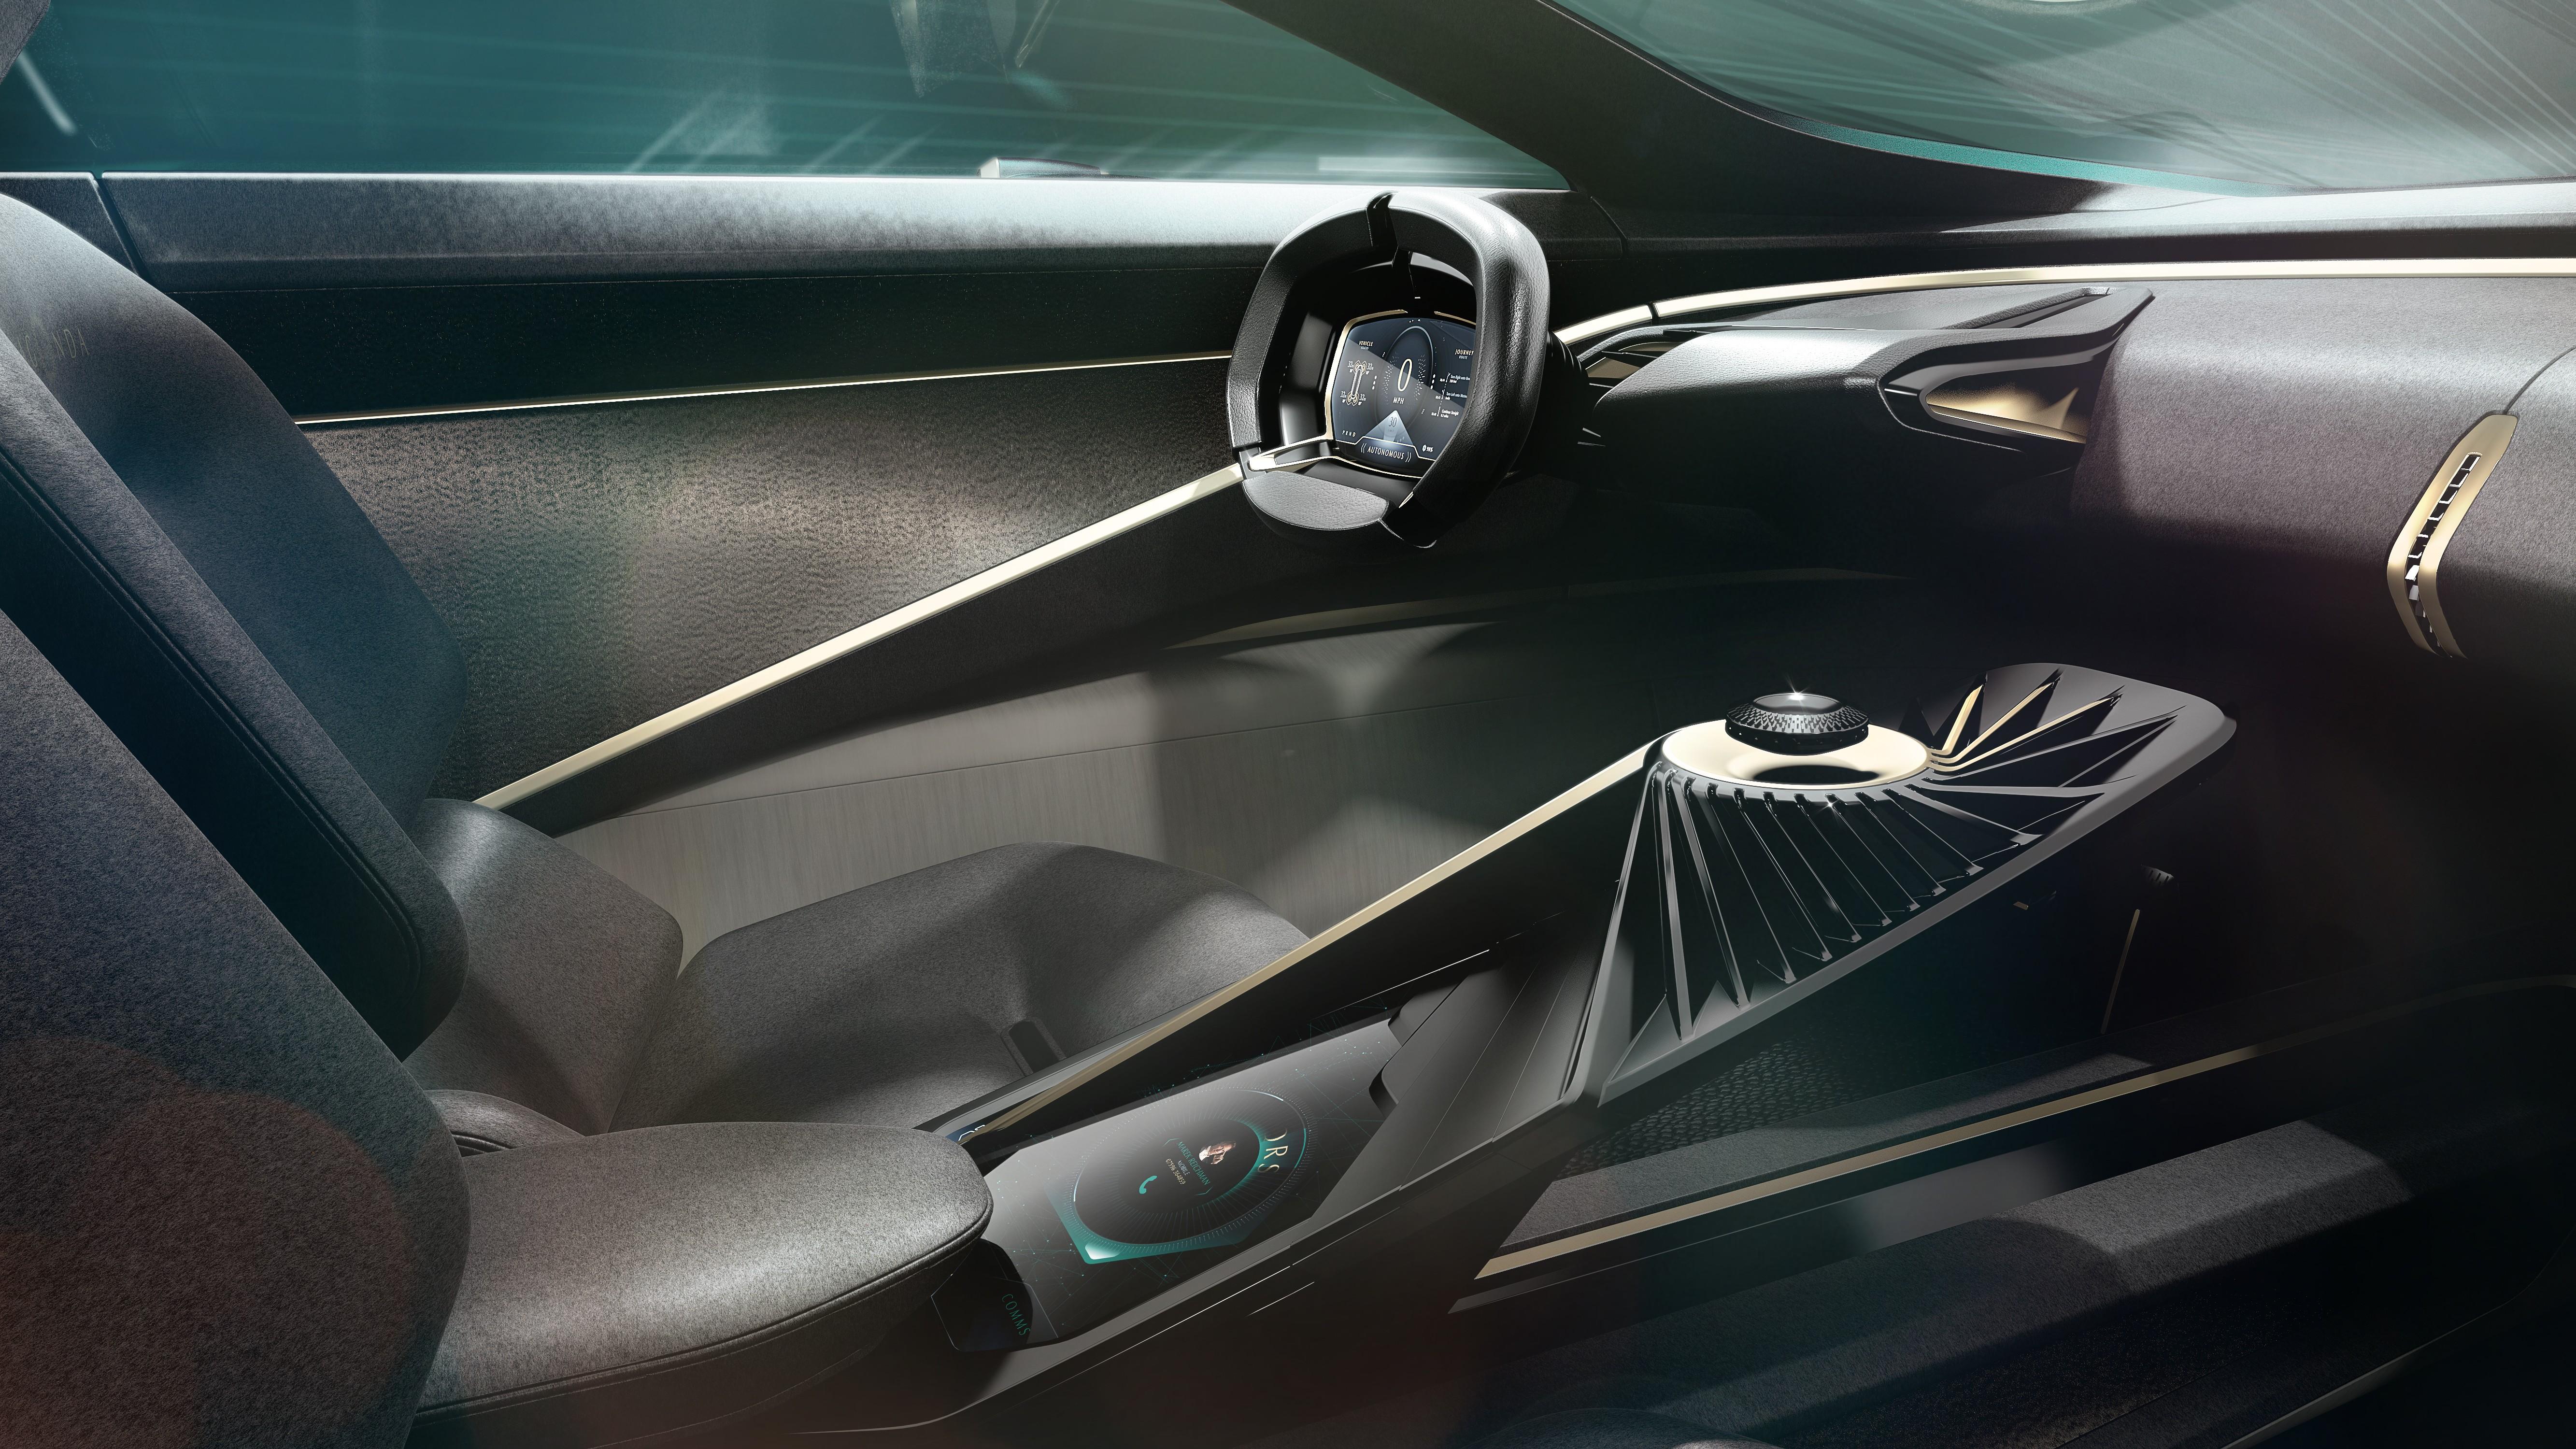 Aston Martin S Lagonda All Terrain Is The Future Of Luxury Suvs Autoevolution